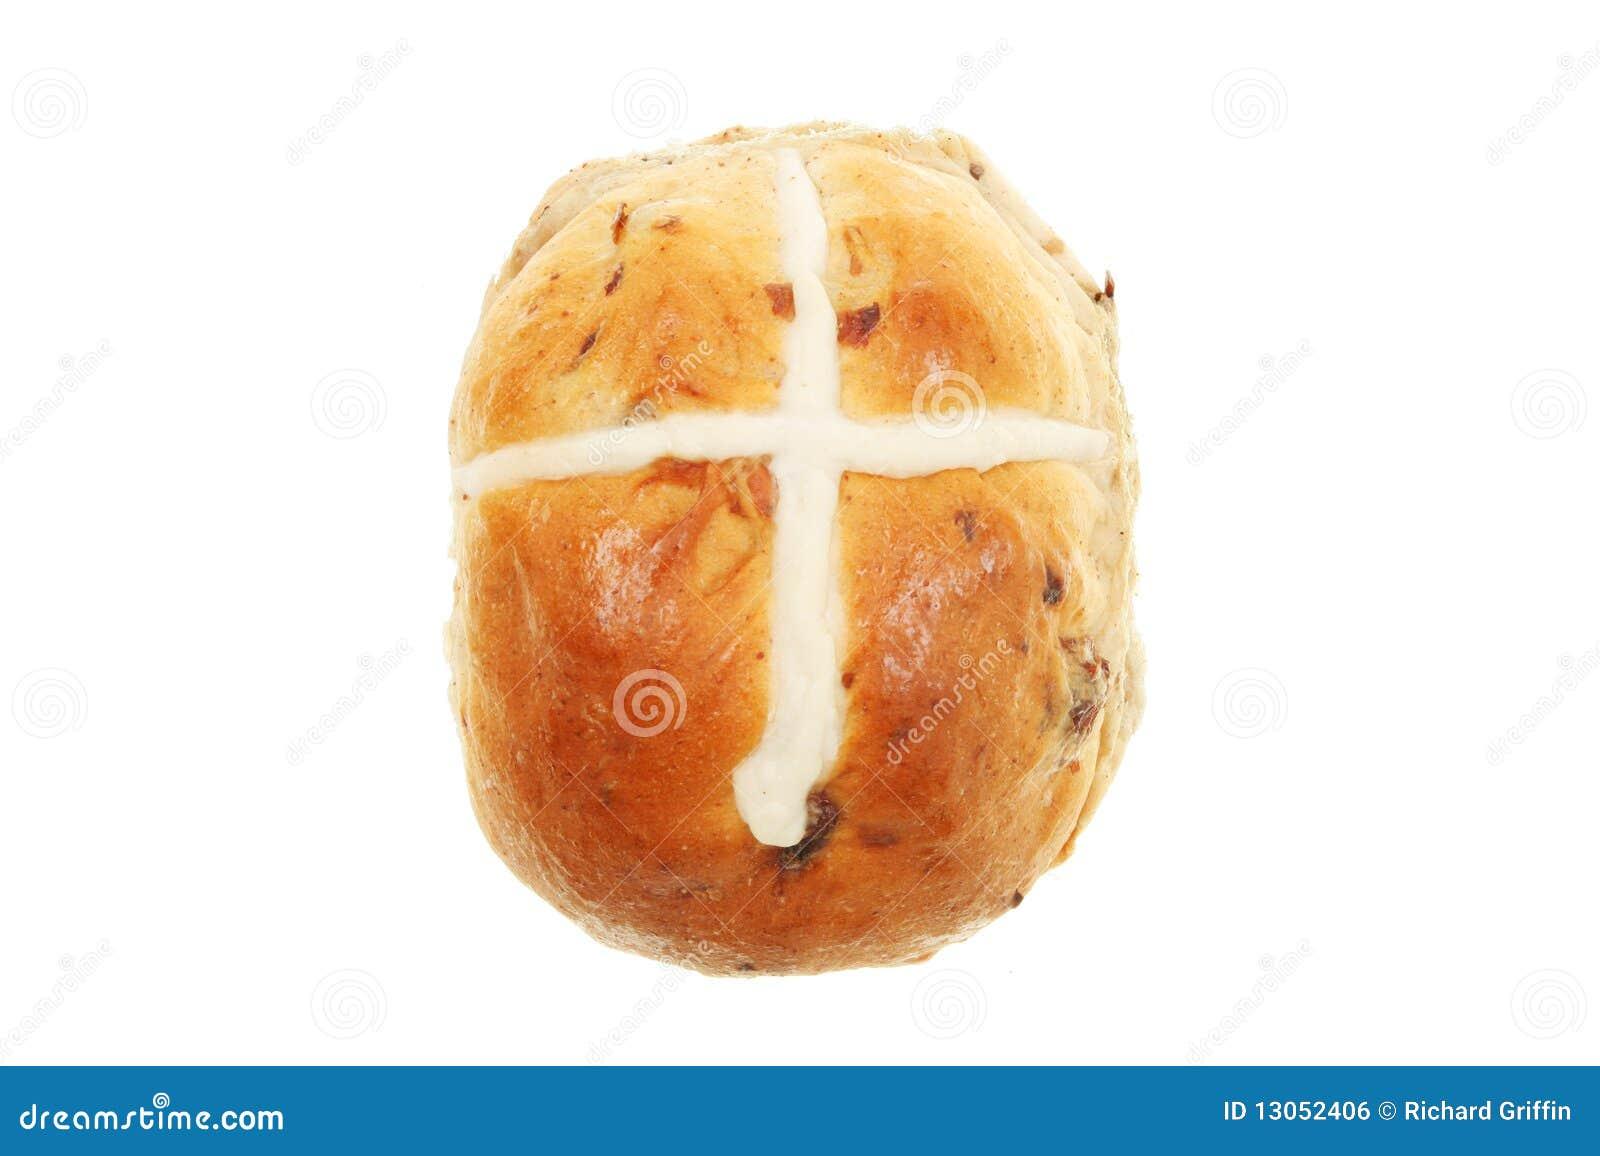 Hot Cross Bun Royalty Free Stock Image - Image: 13052406